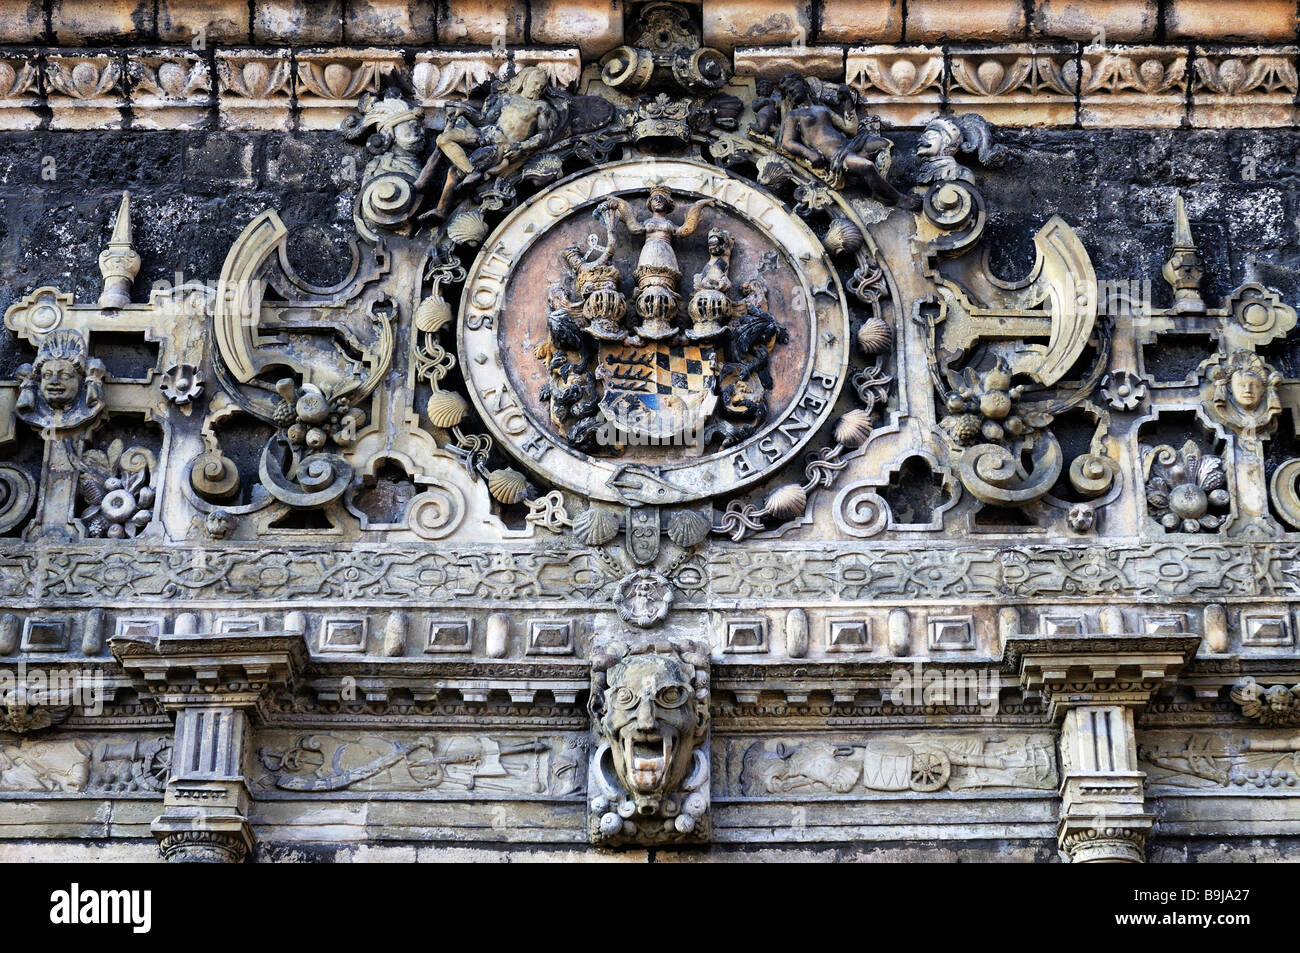 Detailansicht des Gateways an Hohentuebingen Schloss, Tübingen, Baden-Württemberg, Deutschland, Europa Stockbild